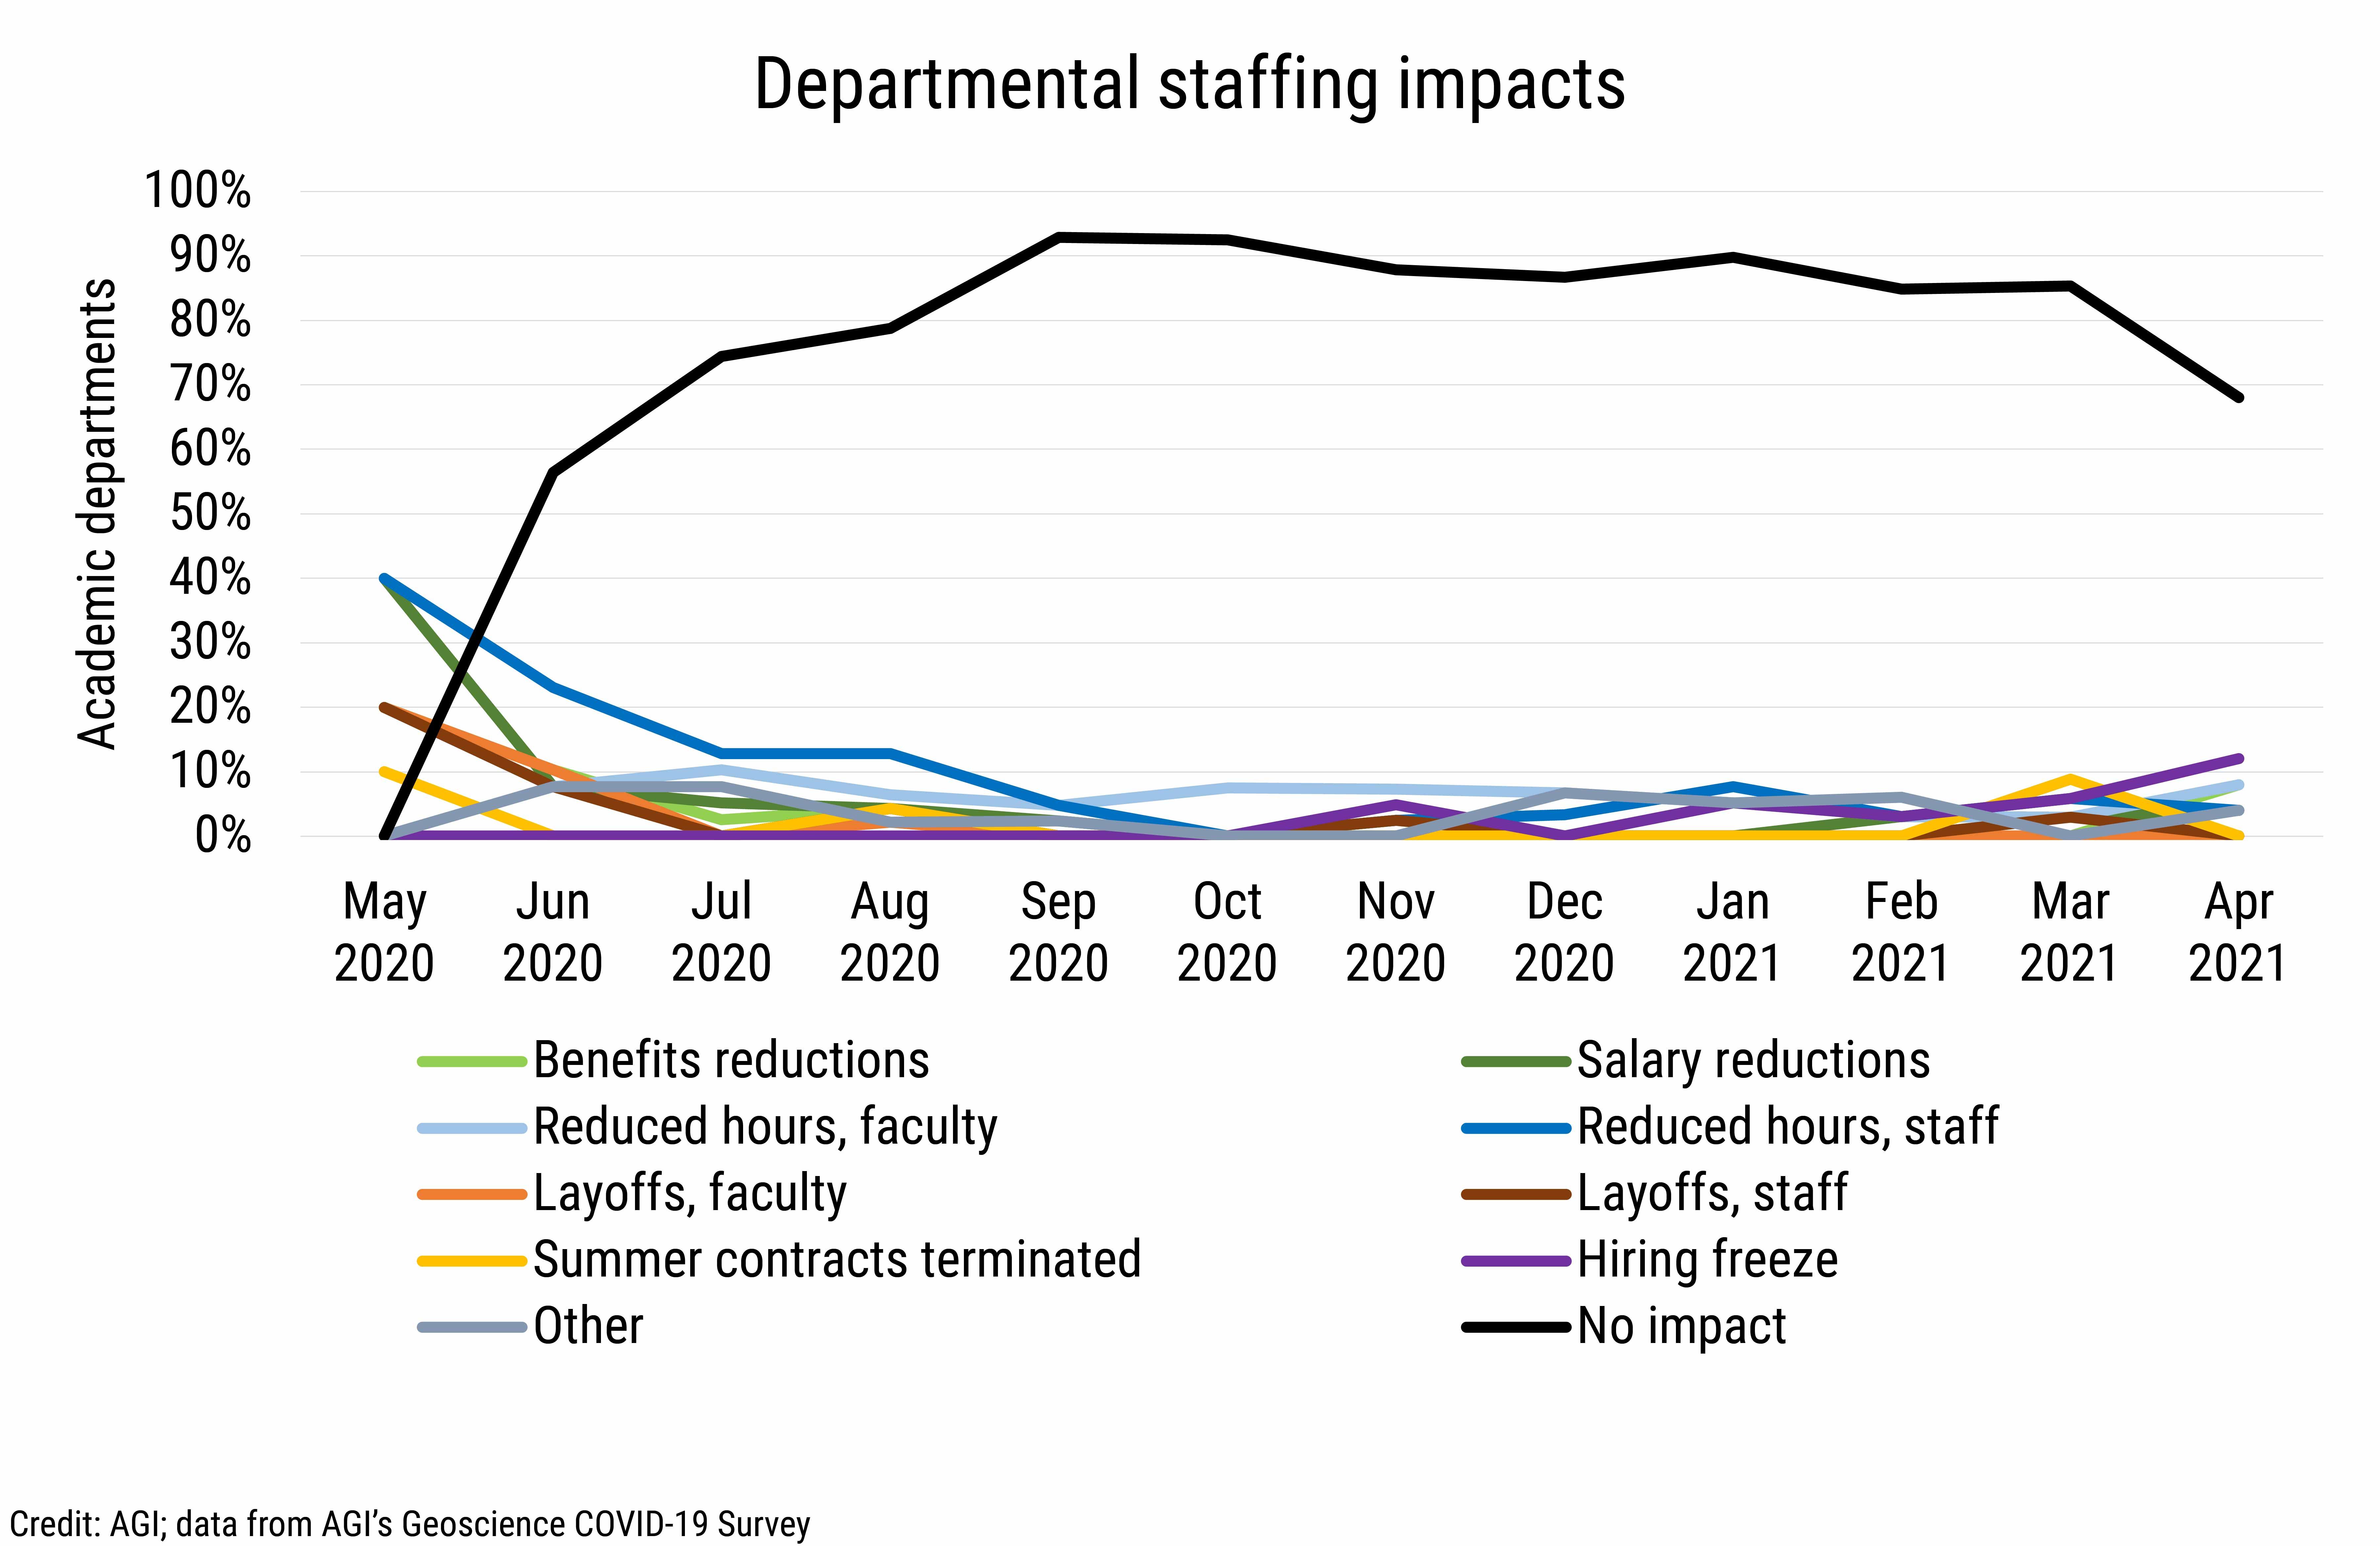 DB_2021-014 chart 02: Departmental staffing impacts (Credit: AGI; data from AGI's Geoscience COVID-19 Survey)